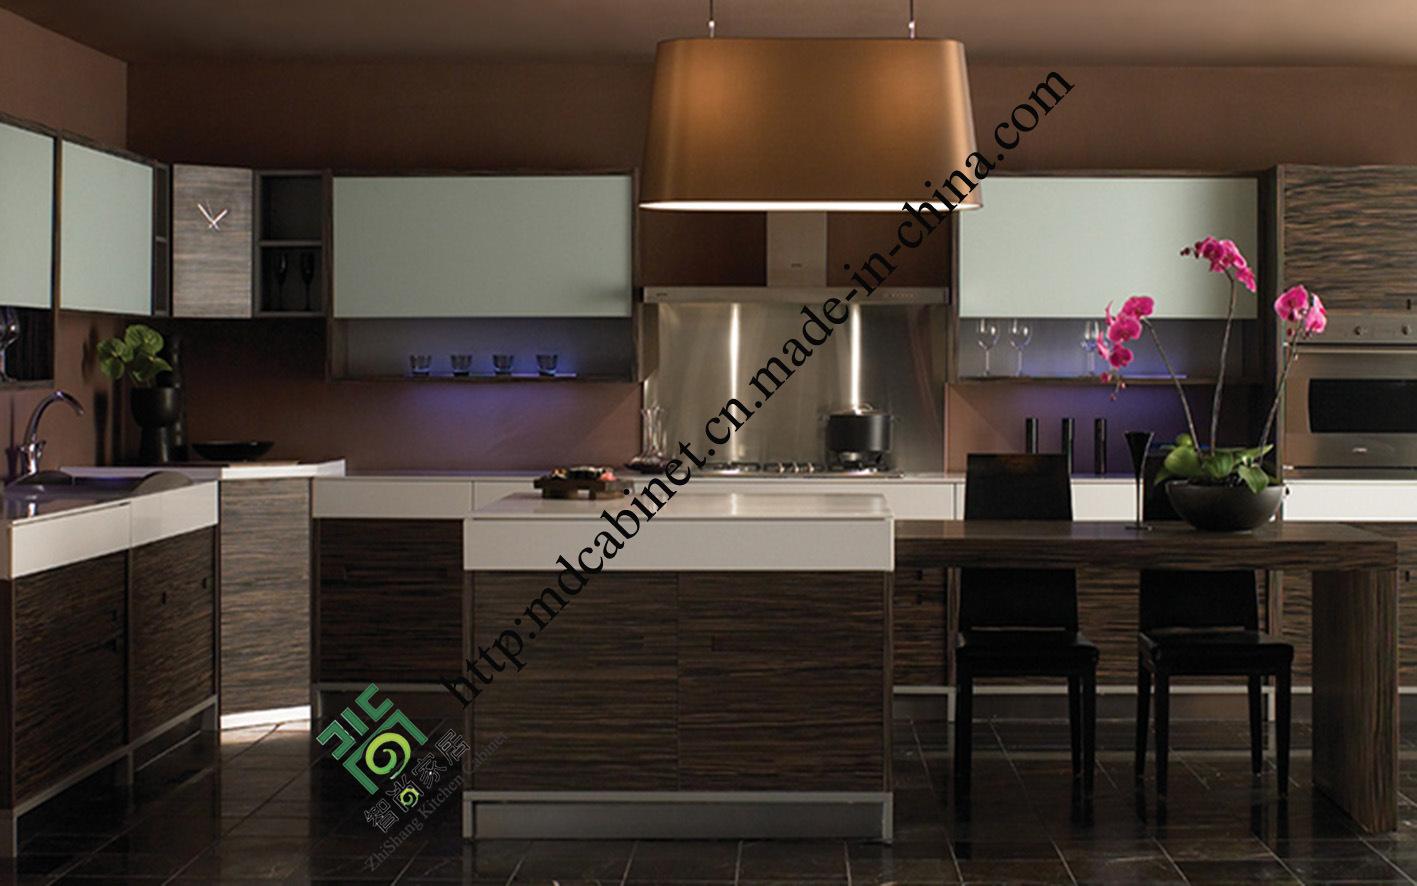 Photos images de cuisine moderne design for Moda le cuisine moderne